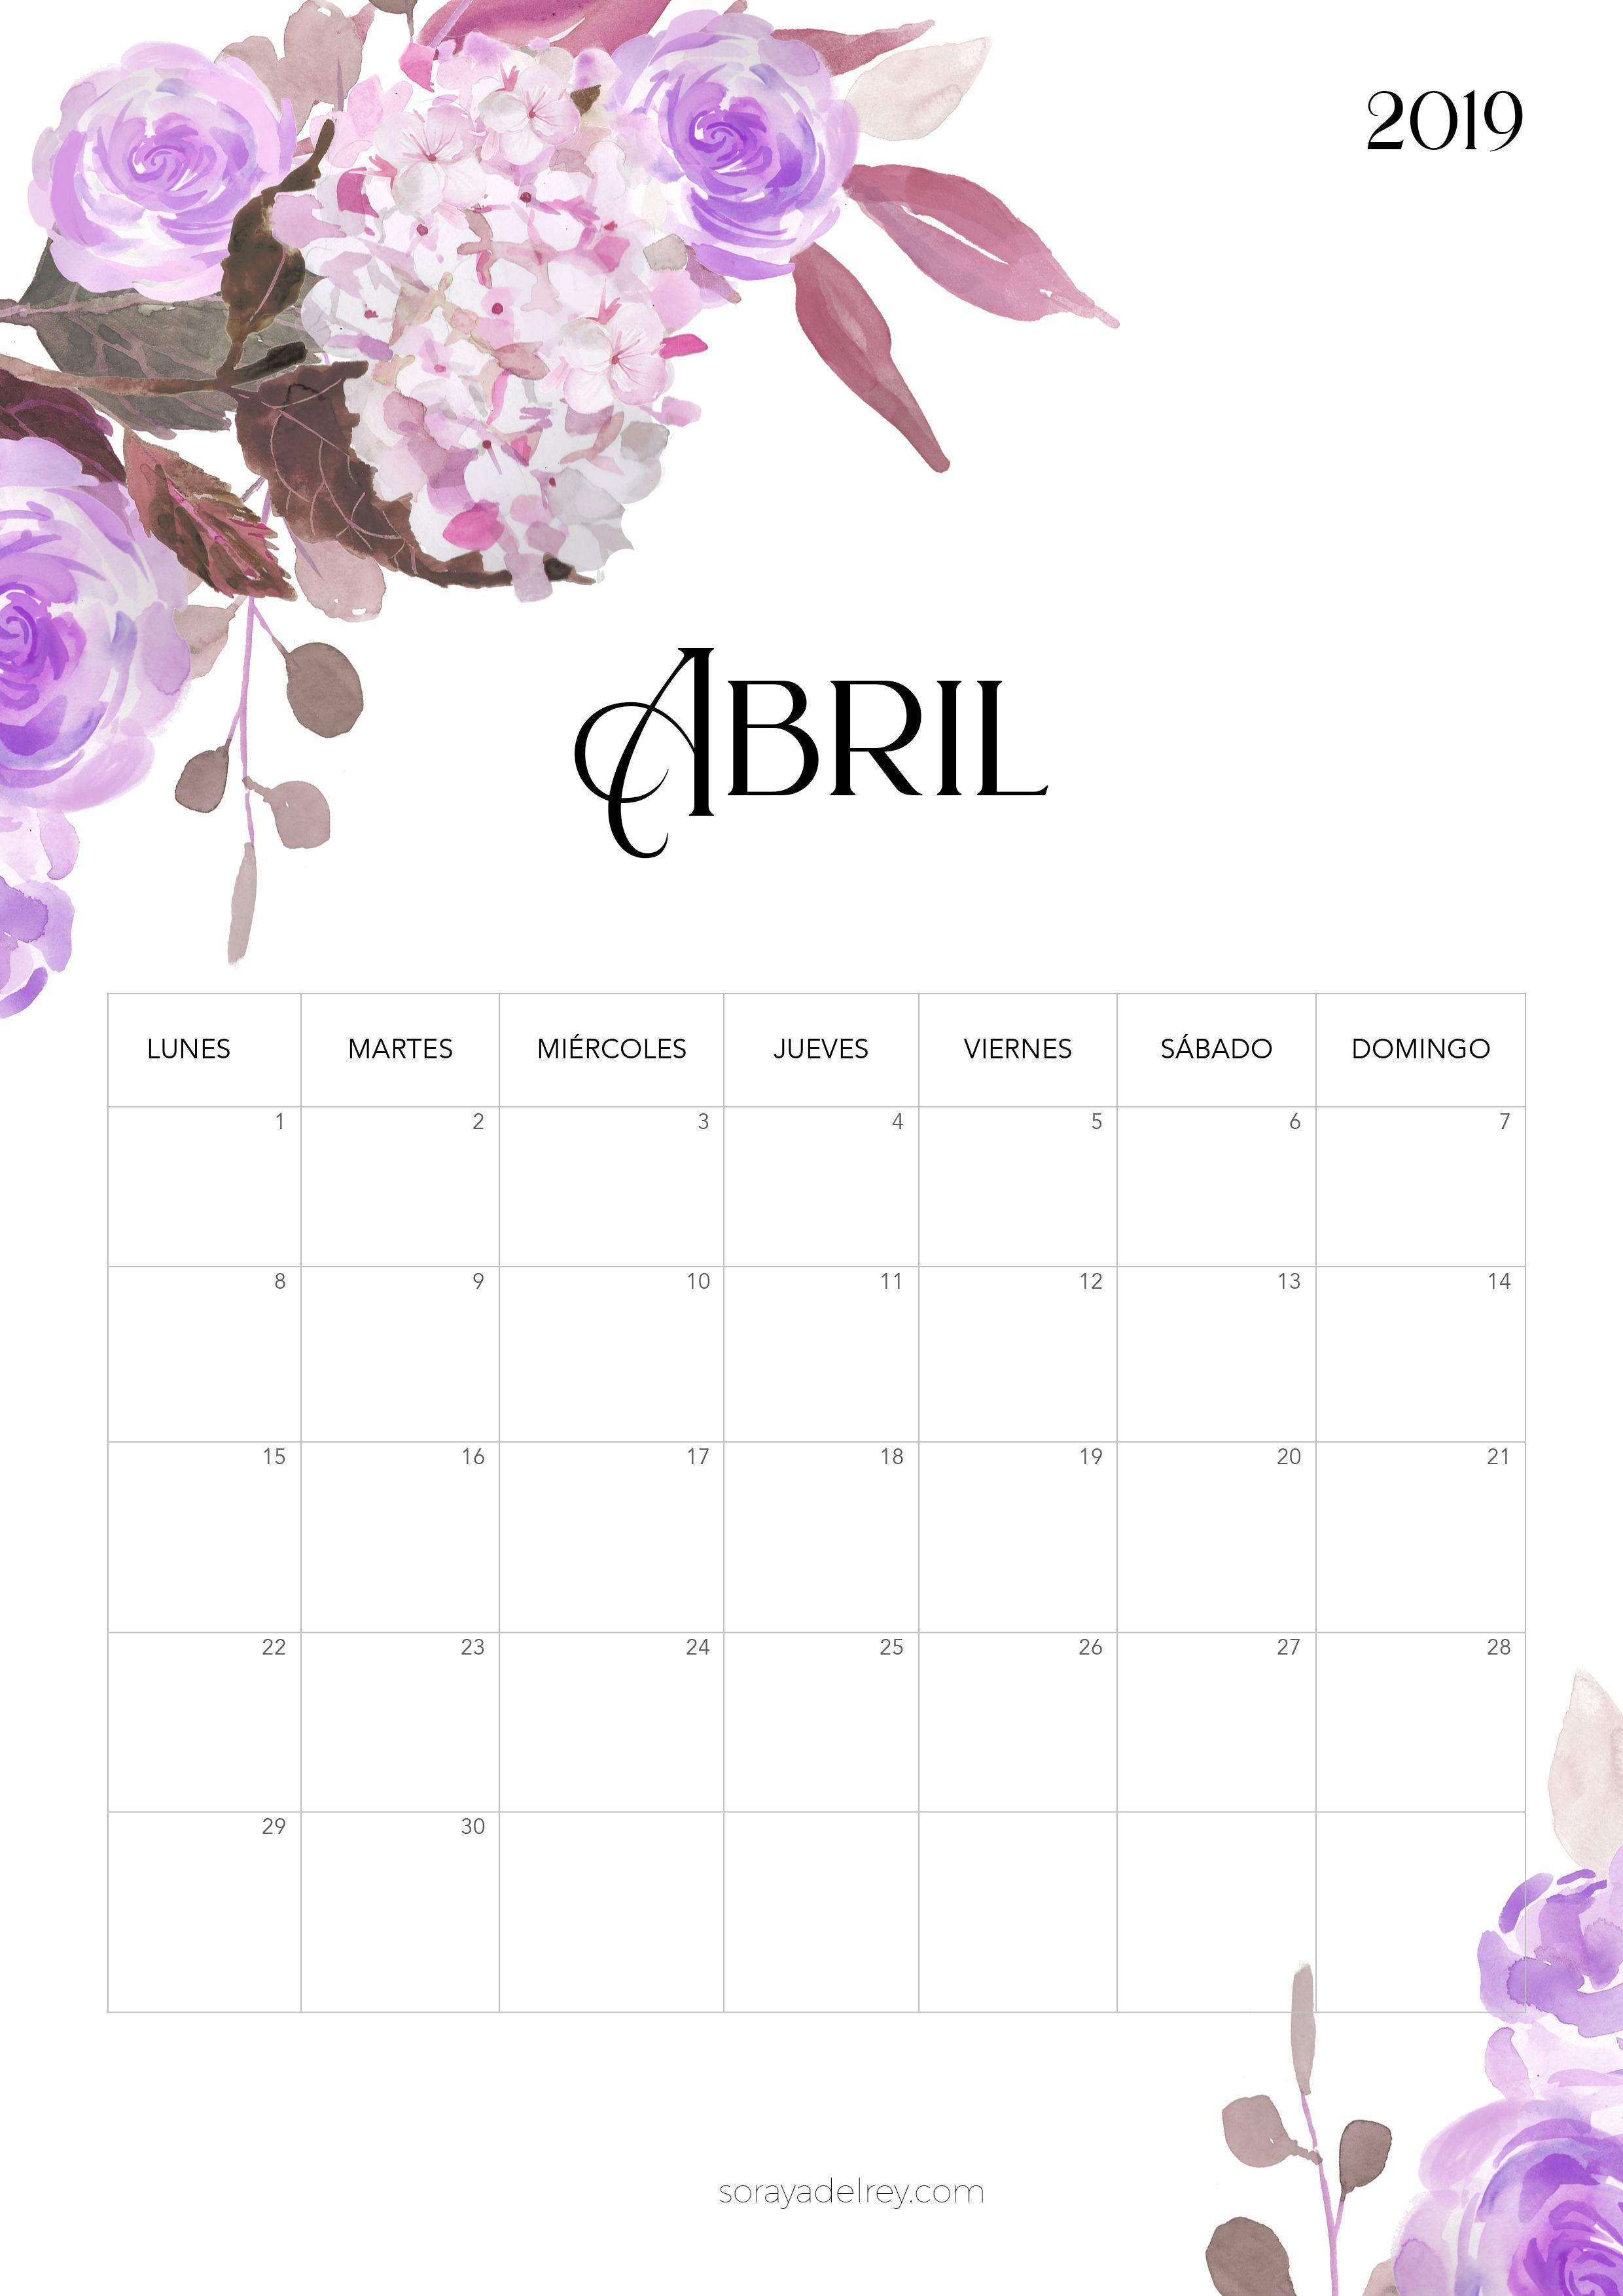 Calendario Para Imprimir 2018 2019 Calendario Para Imprimir